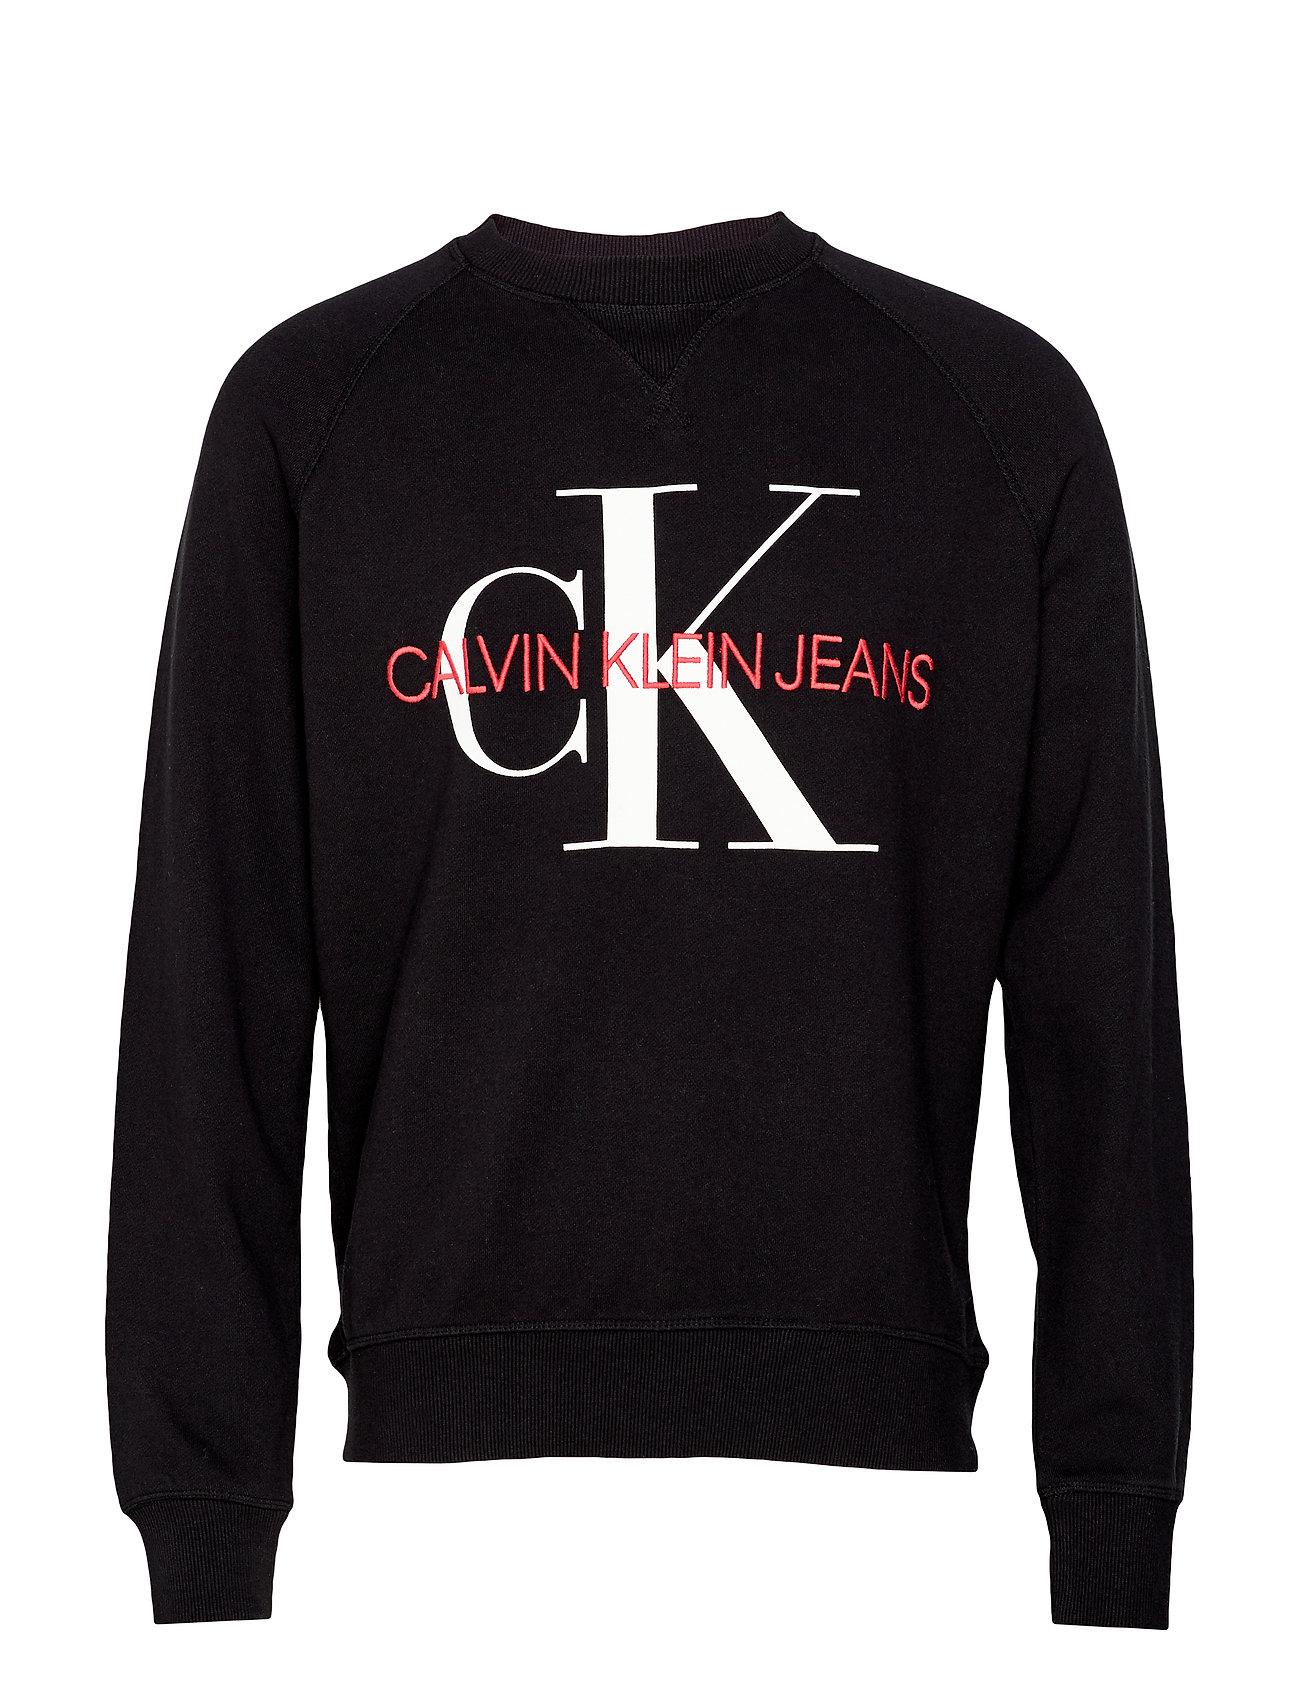 Calvin Klein Jeans WASHED REG MONOGRAM CN - CK BLACK